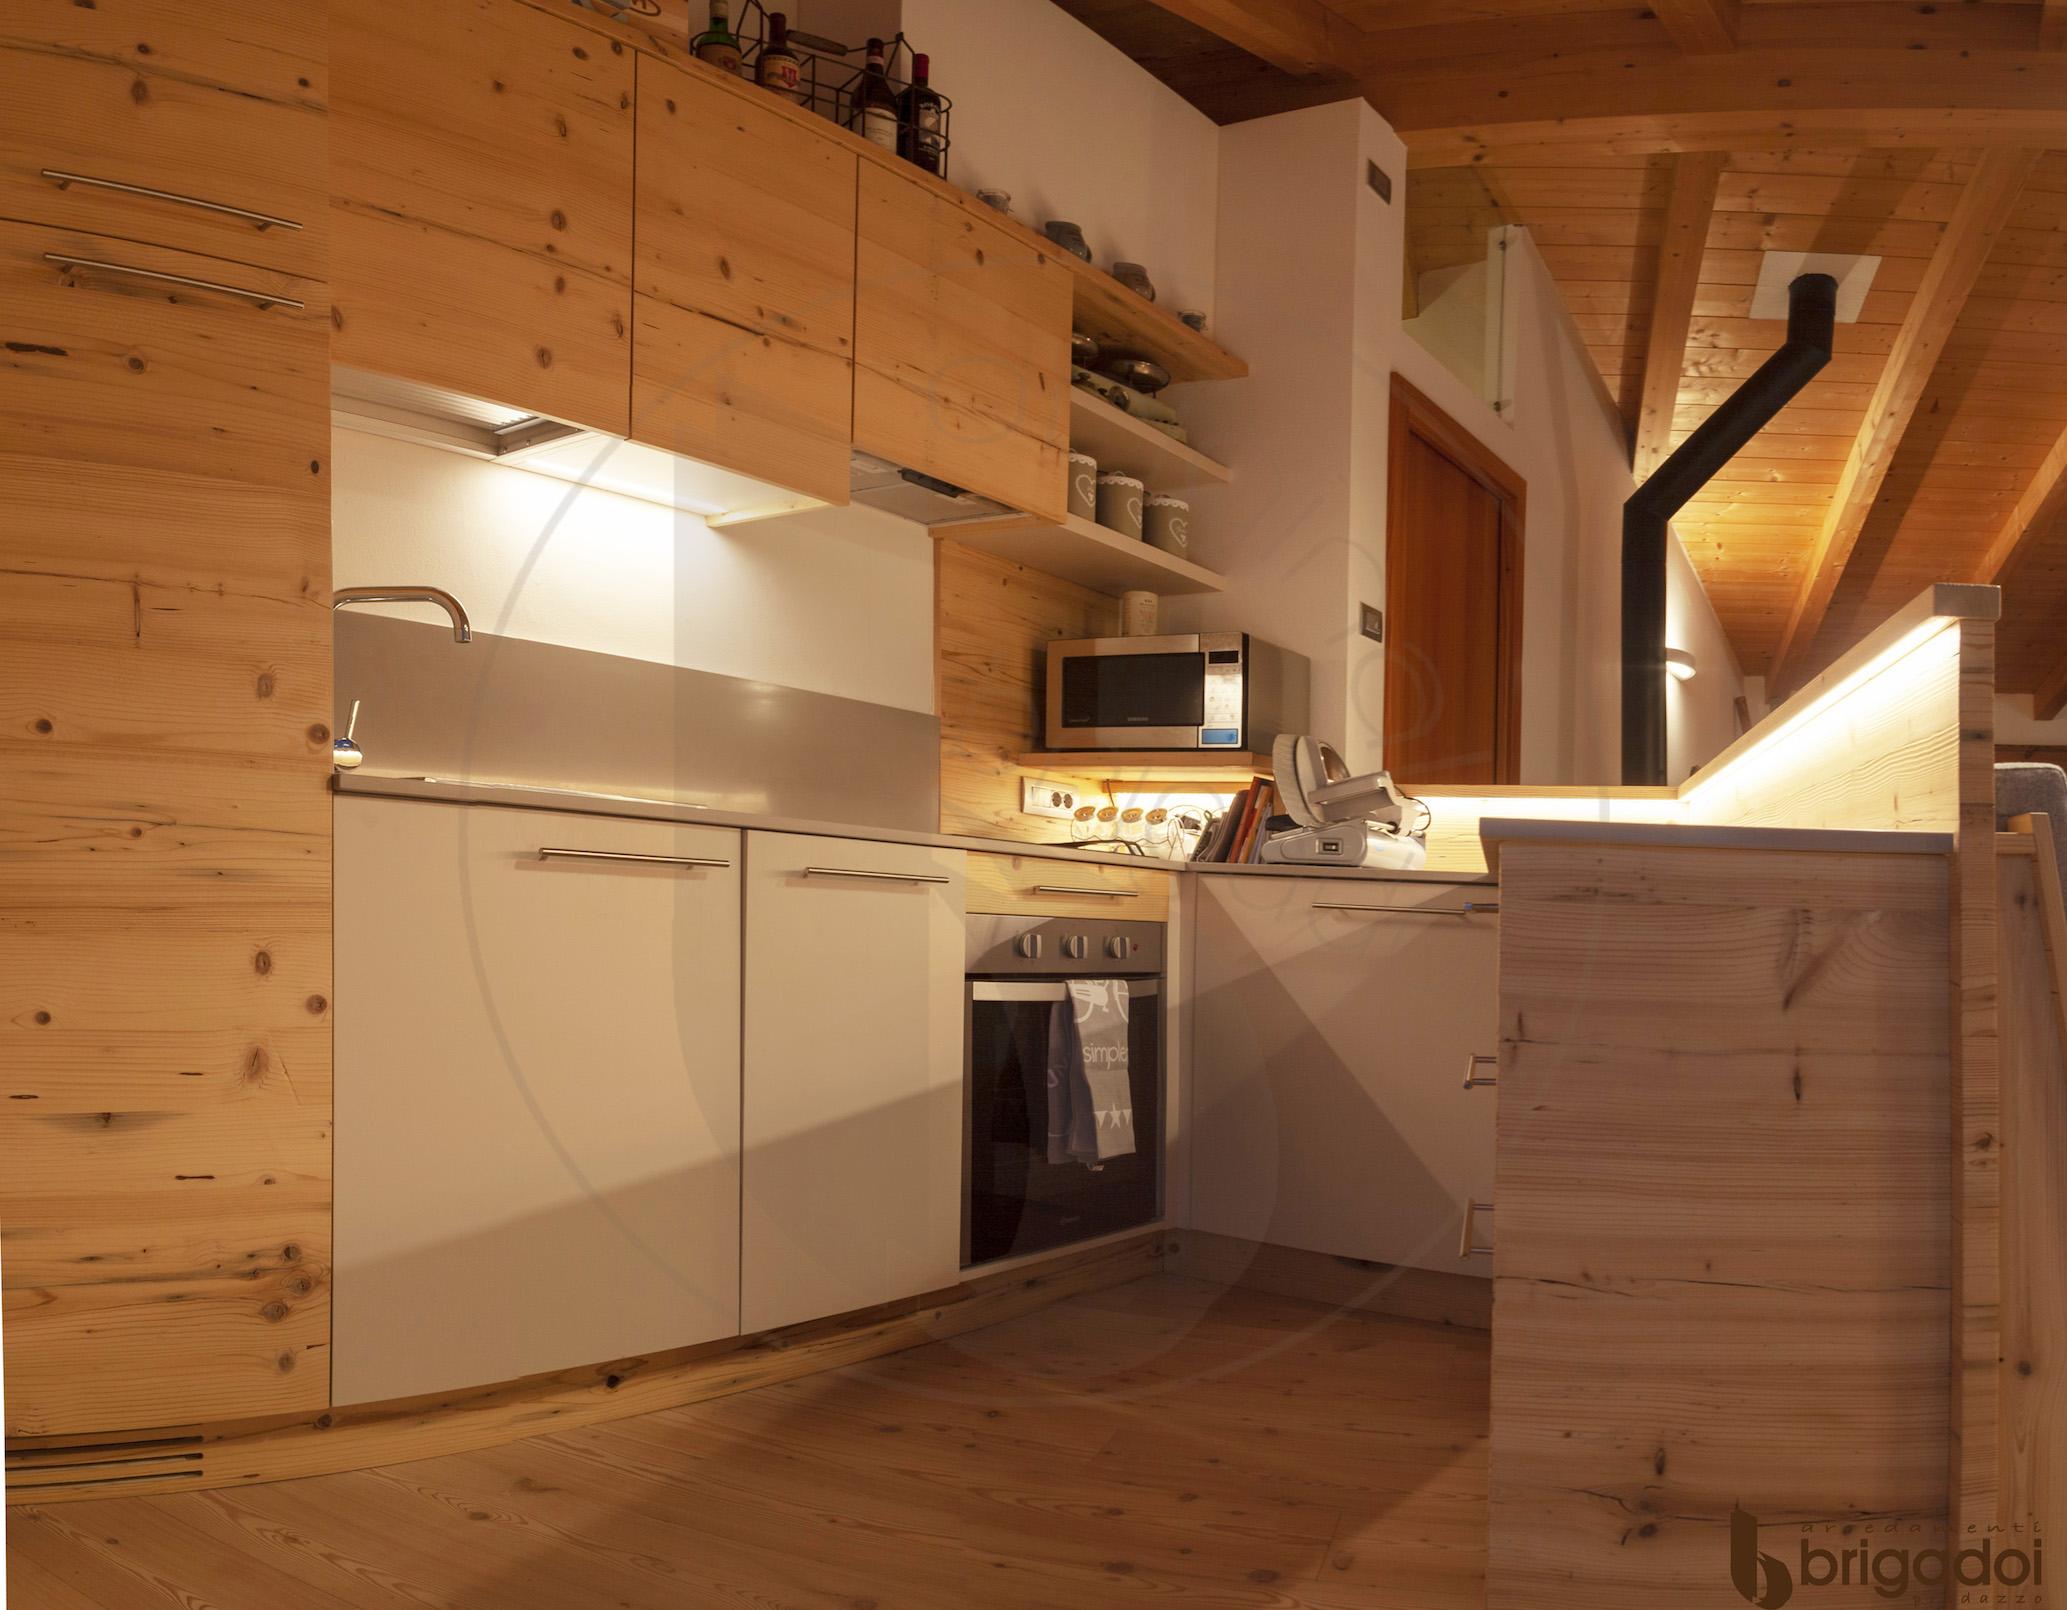 arredamenti falegnameria brigadoi legno trentino val di fiemme design mountain dolomiti cucina